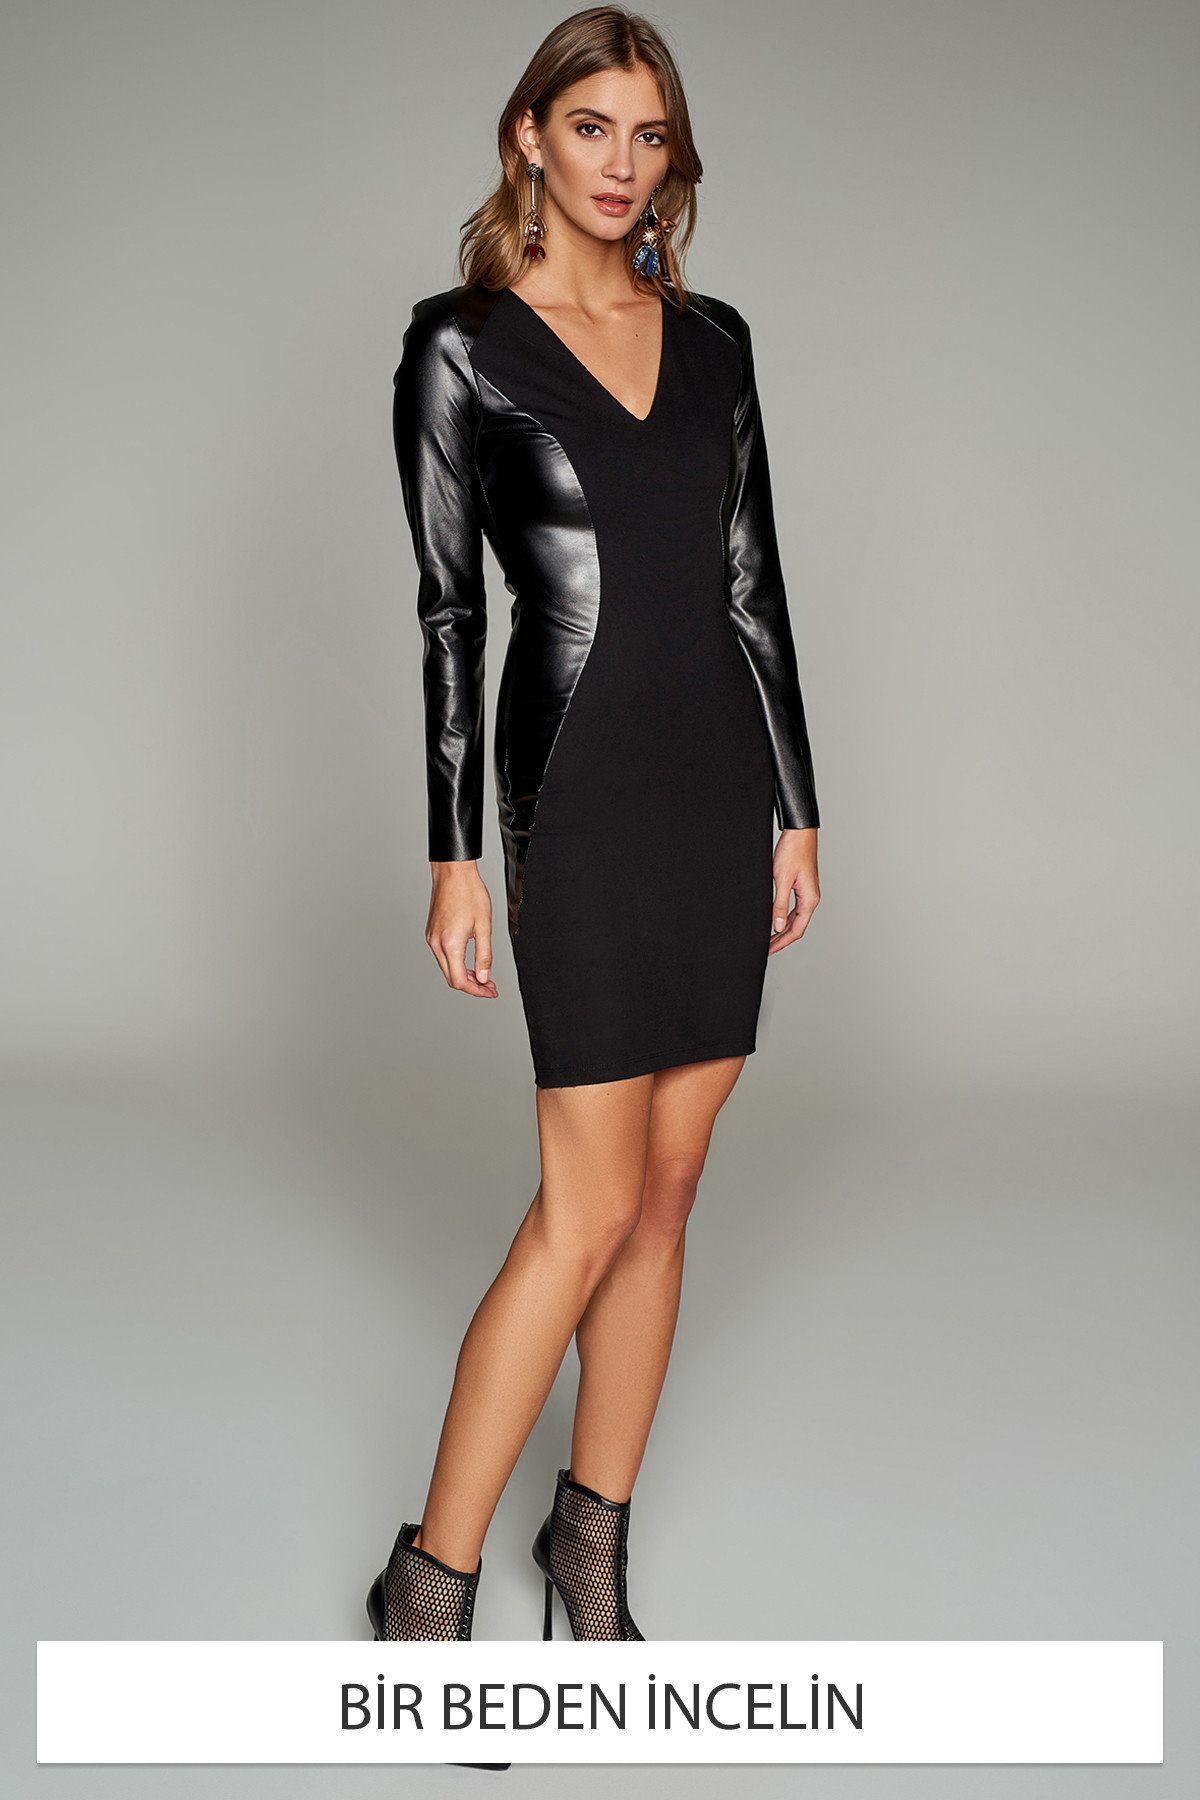 Siyah Deri Detayli Incelten Elbise Trendyolmilla Trendyol Elbise Siyah Deri Elbise Modelleri